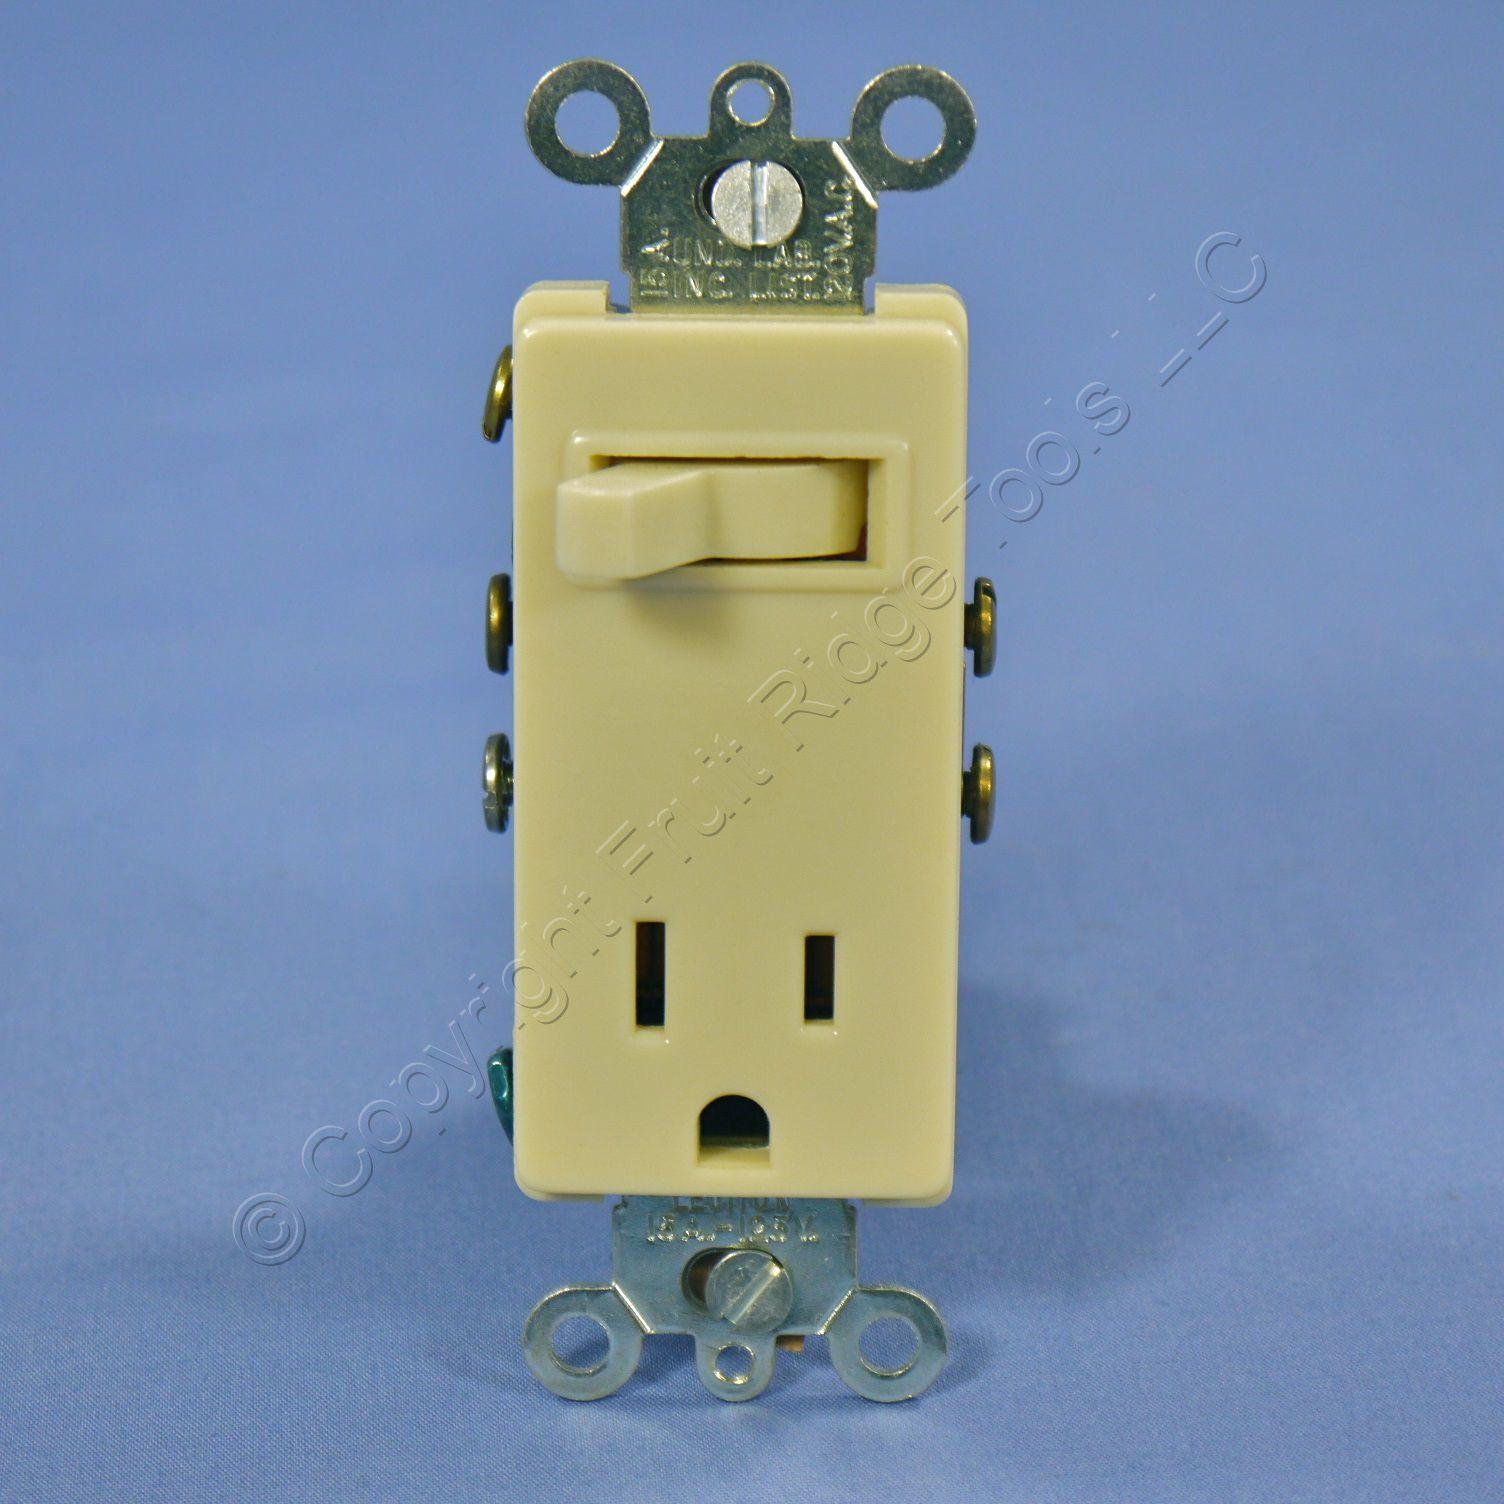 Tub Wiring Diagram 220 Volt Wiring Diagram Gfci Breaker Wiring Diagram